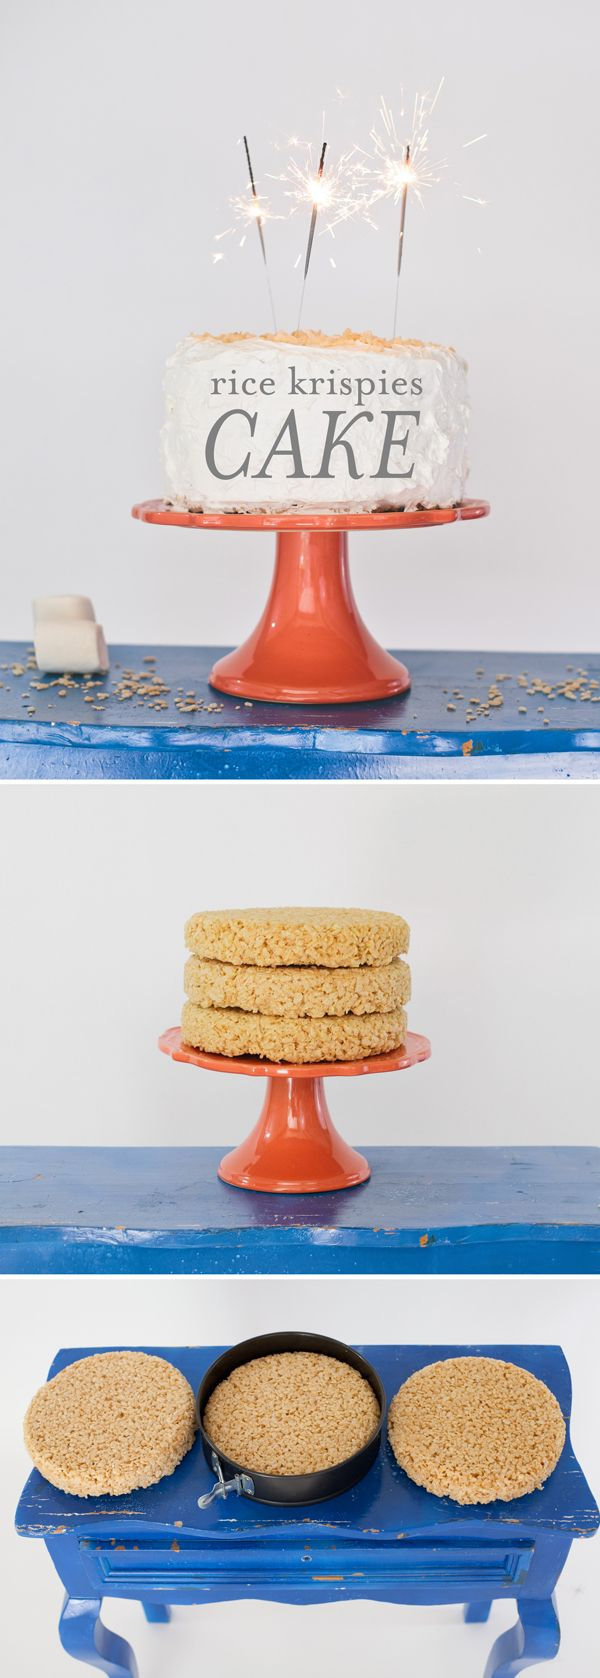 Rice Krispies cake.